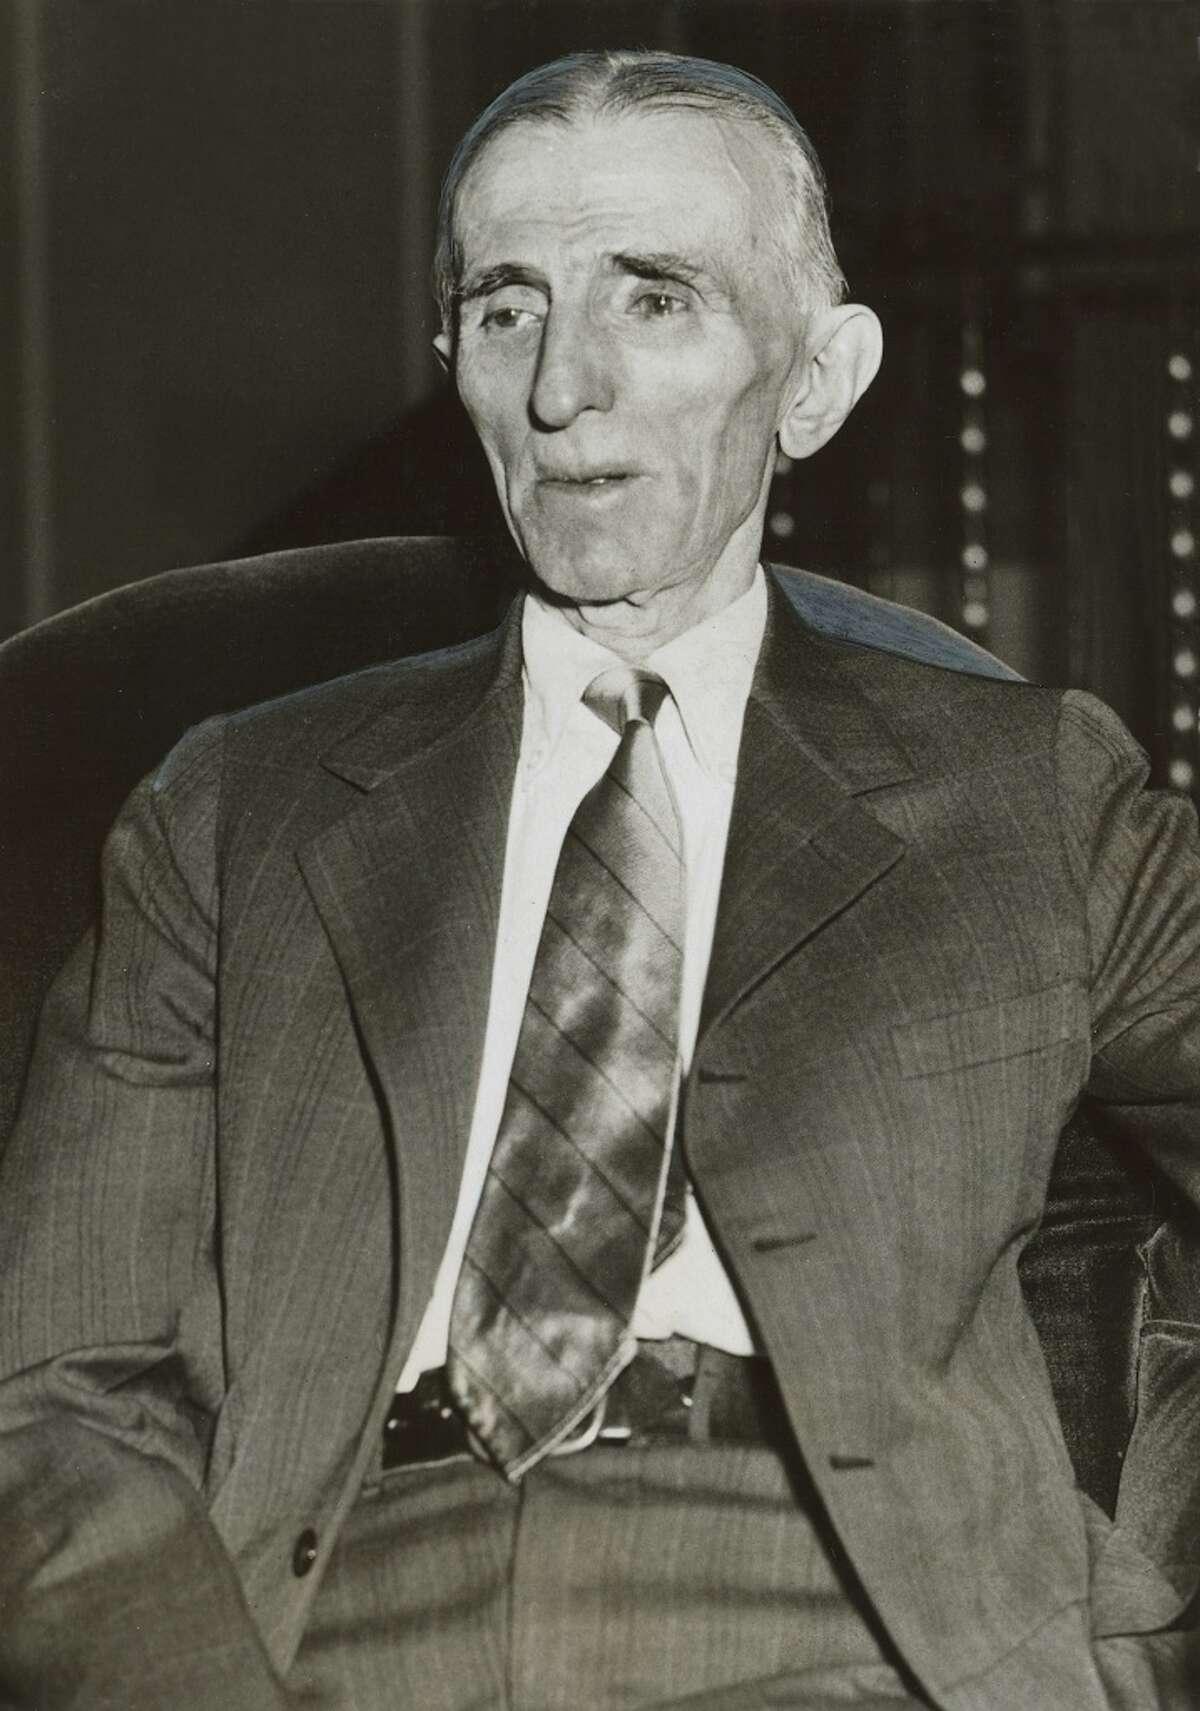 July 12, 1933 - Nikola Tesla